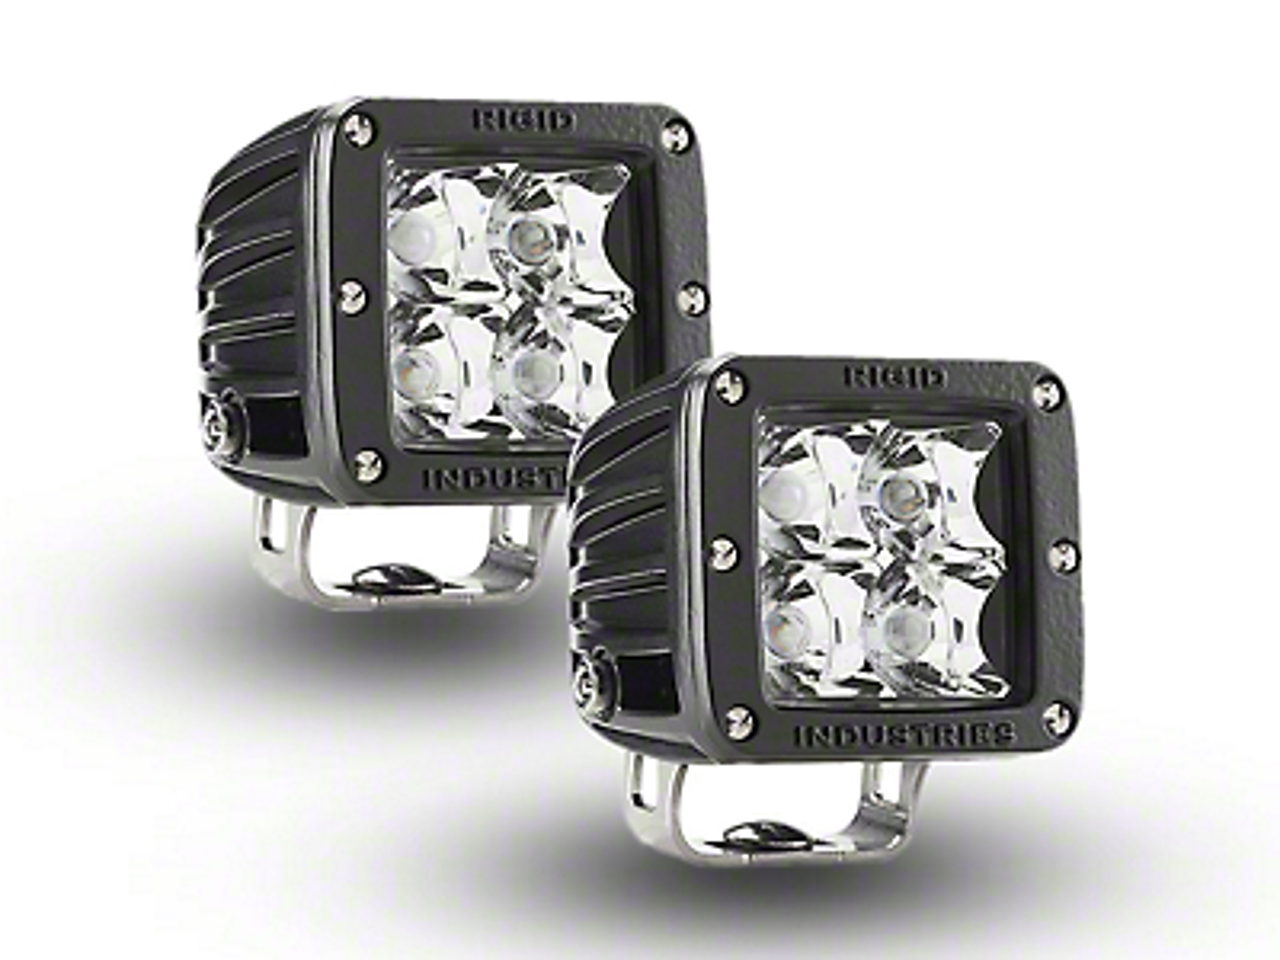 Rigid Industries E-Mark Dually LED Cube Lights - Spot Beam - Pair (97-18 All)